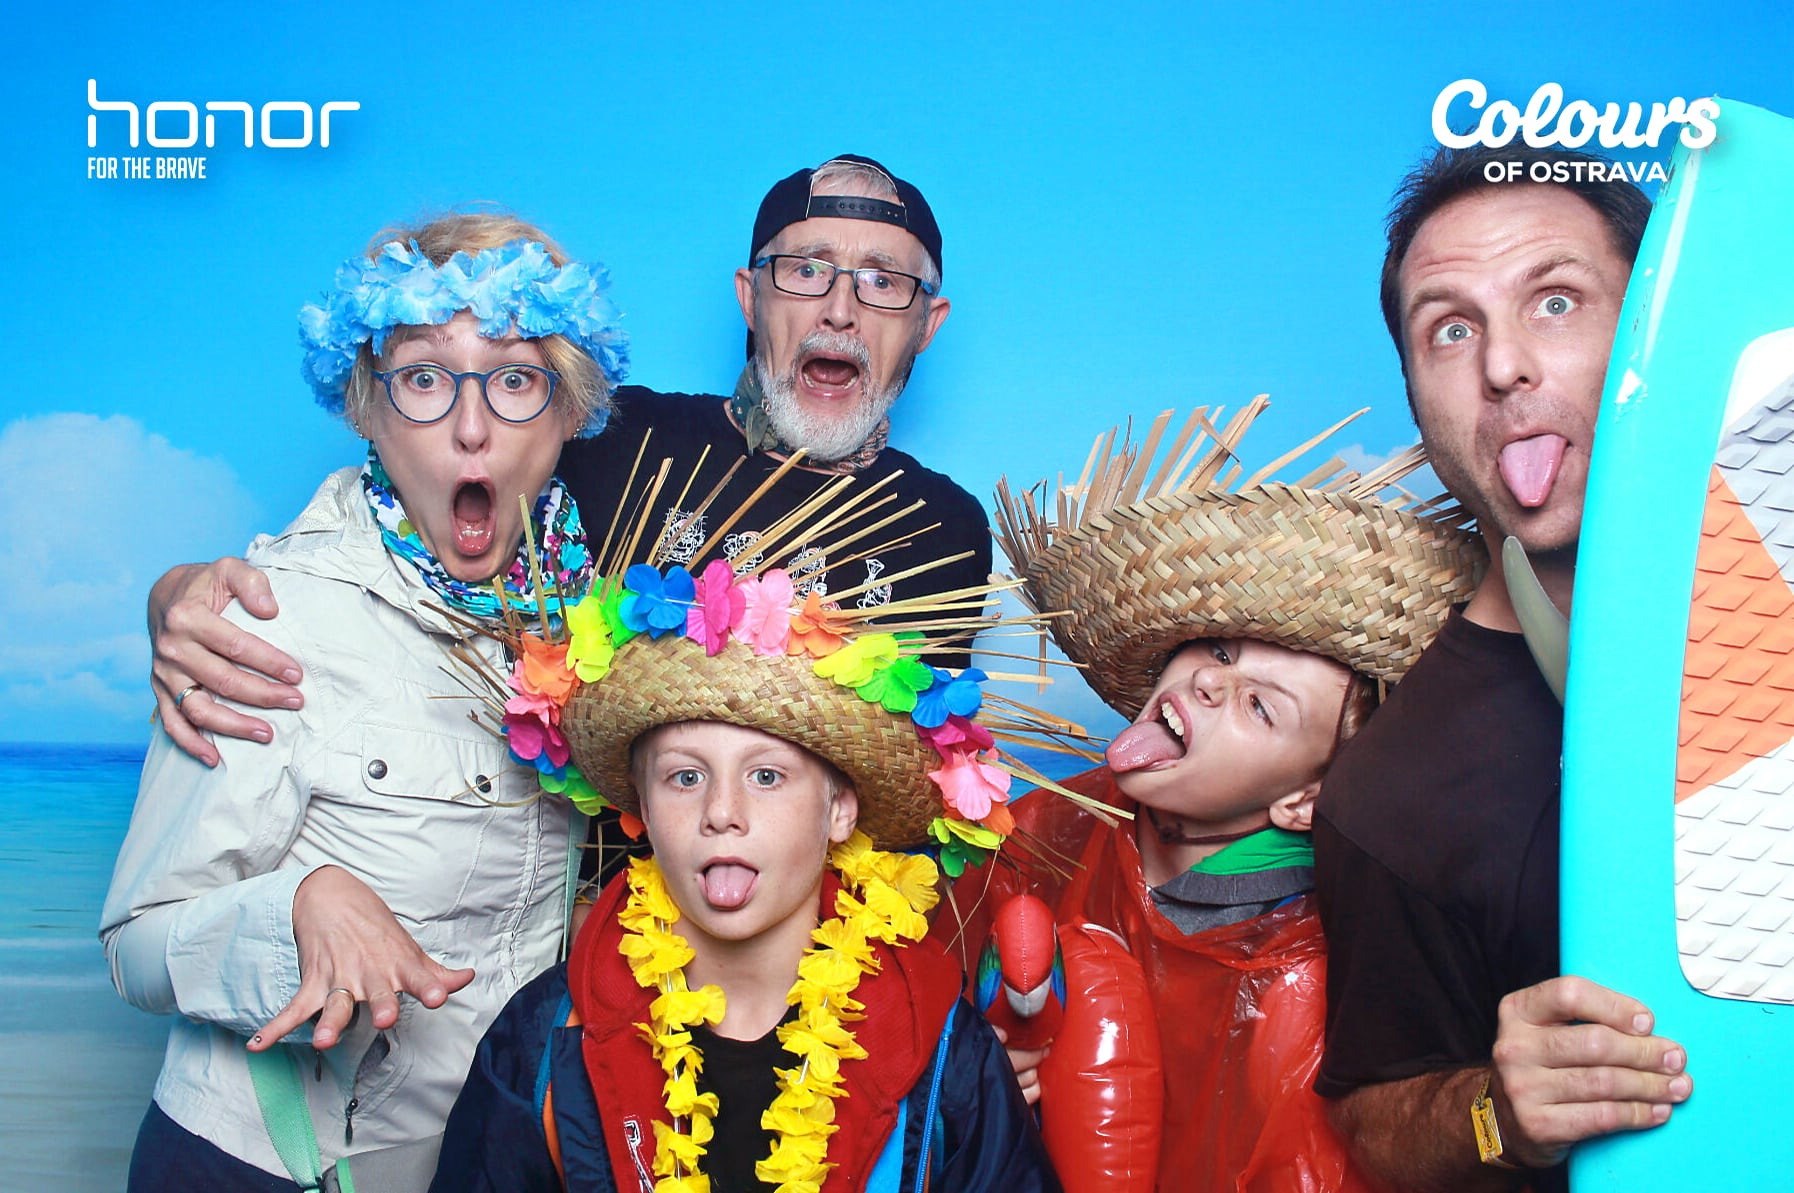 fotokoutek-festival-ostrava-honor-colours-of-ostrava-18-7-2018-462181